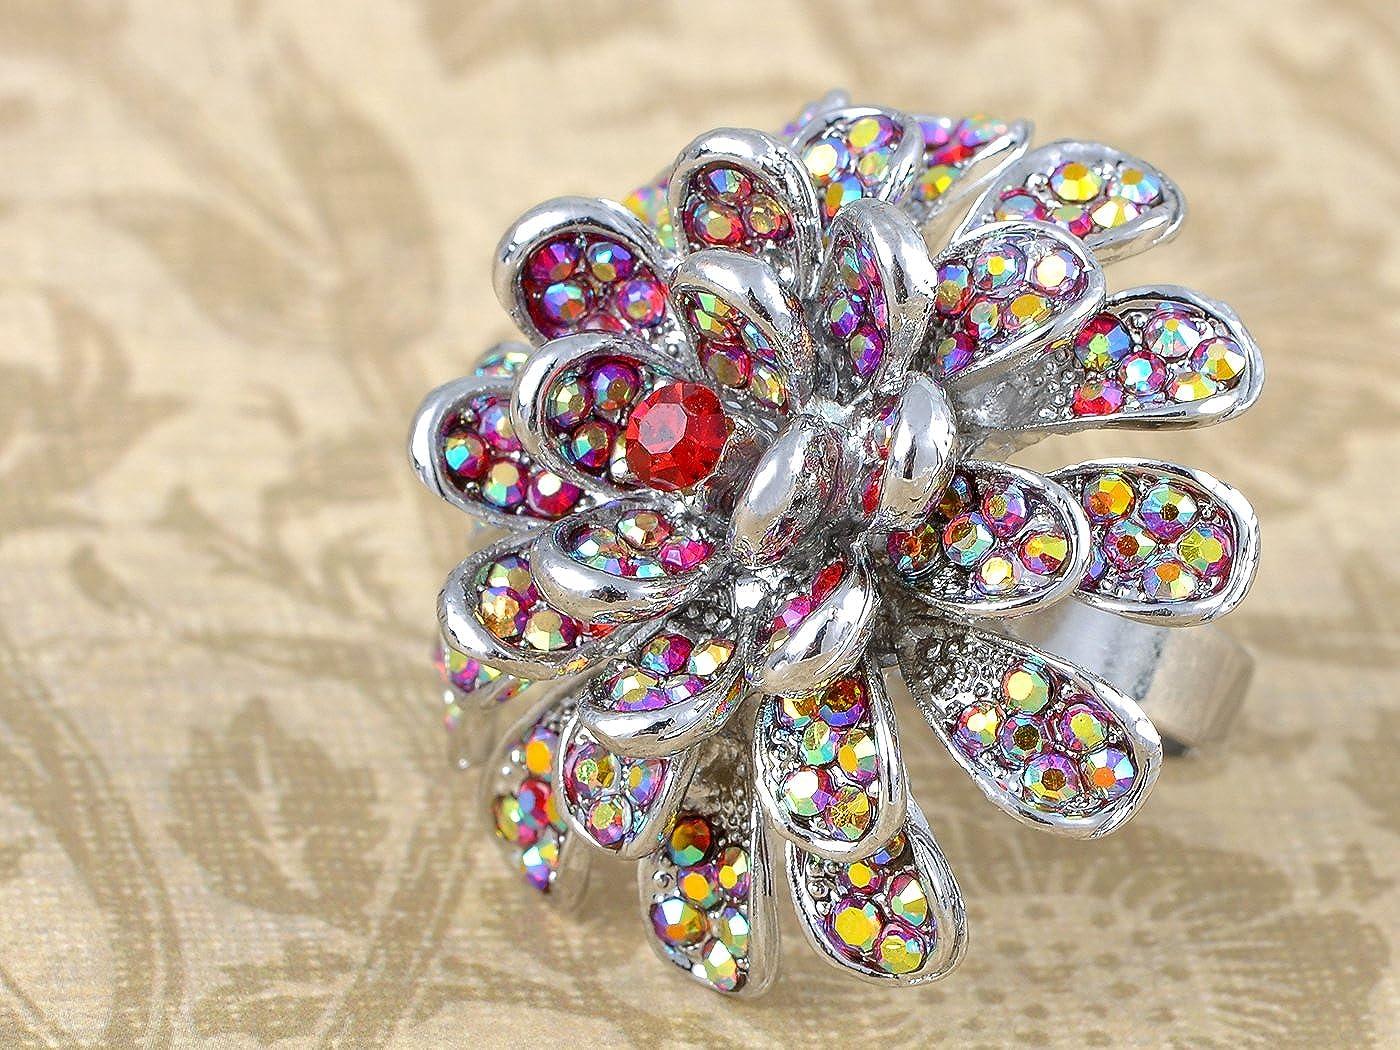 Fire Ruby Red Rhinestone Carnation Flower Fashion Custom Adjustable Ring Jewel